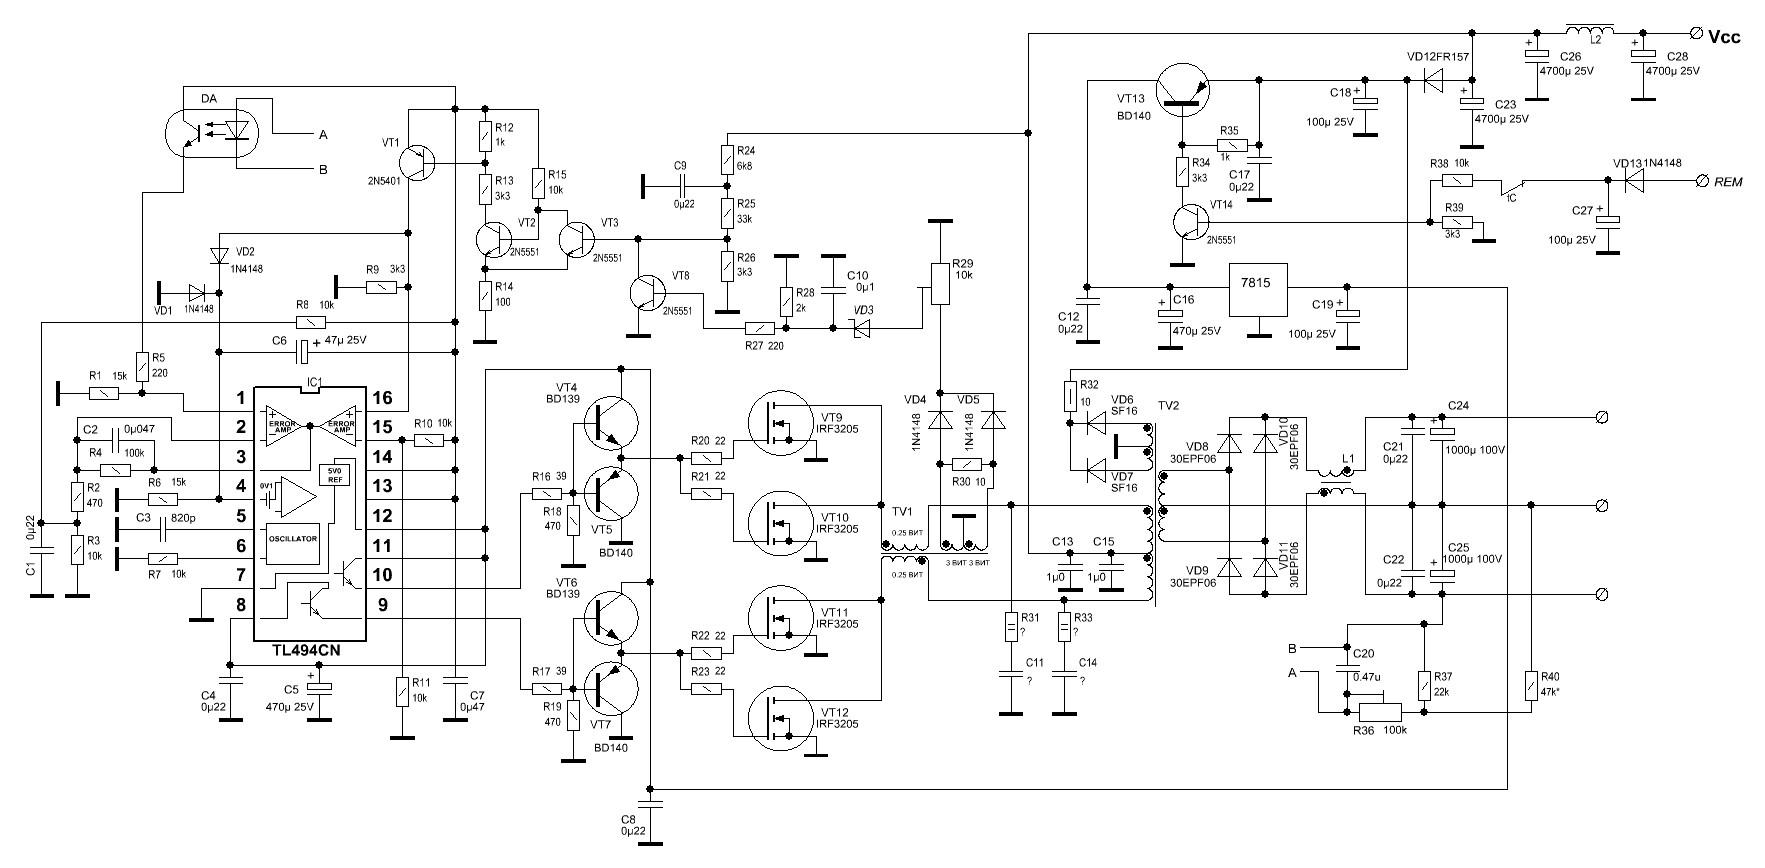 Blaupunkt gta 270 схема подключения